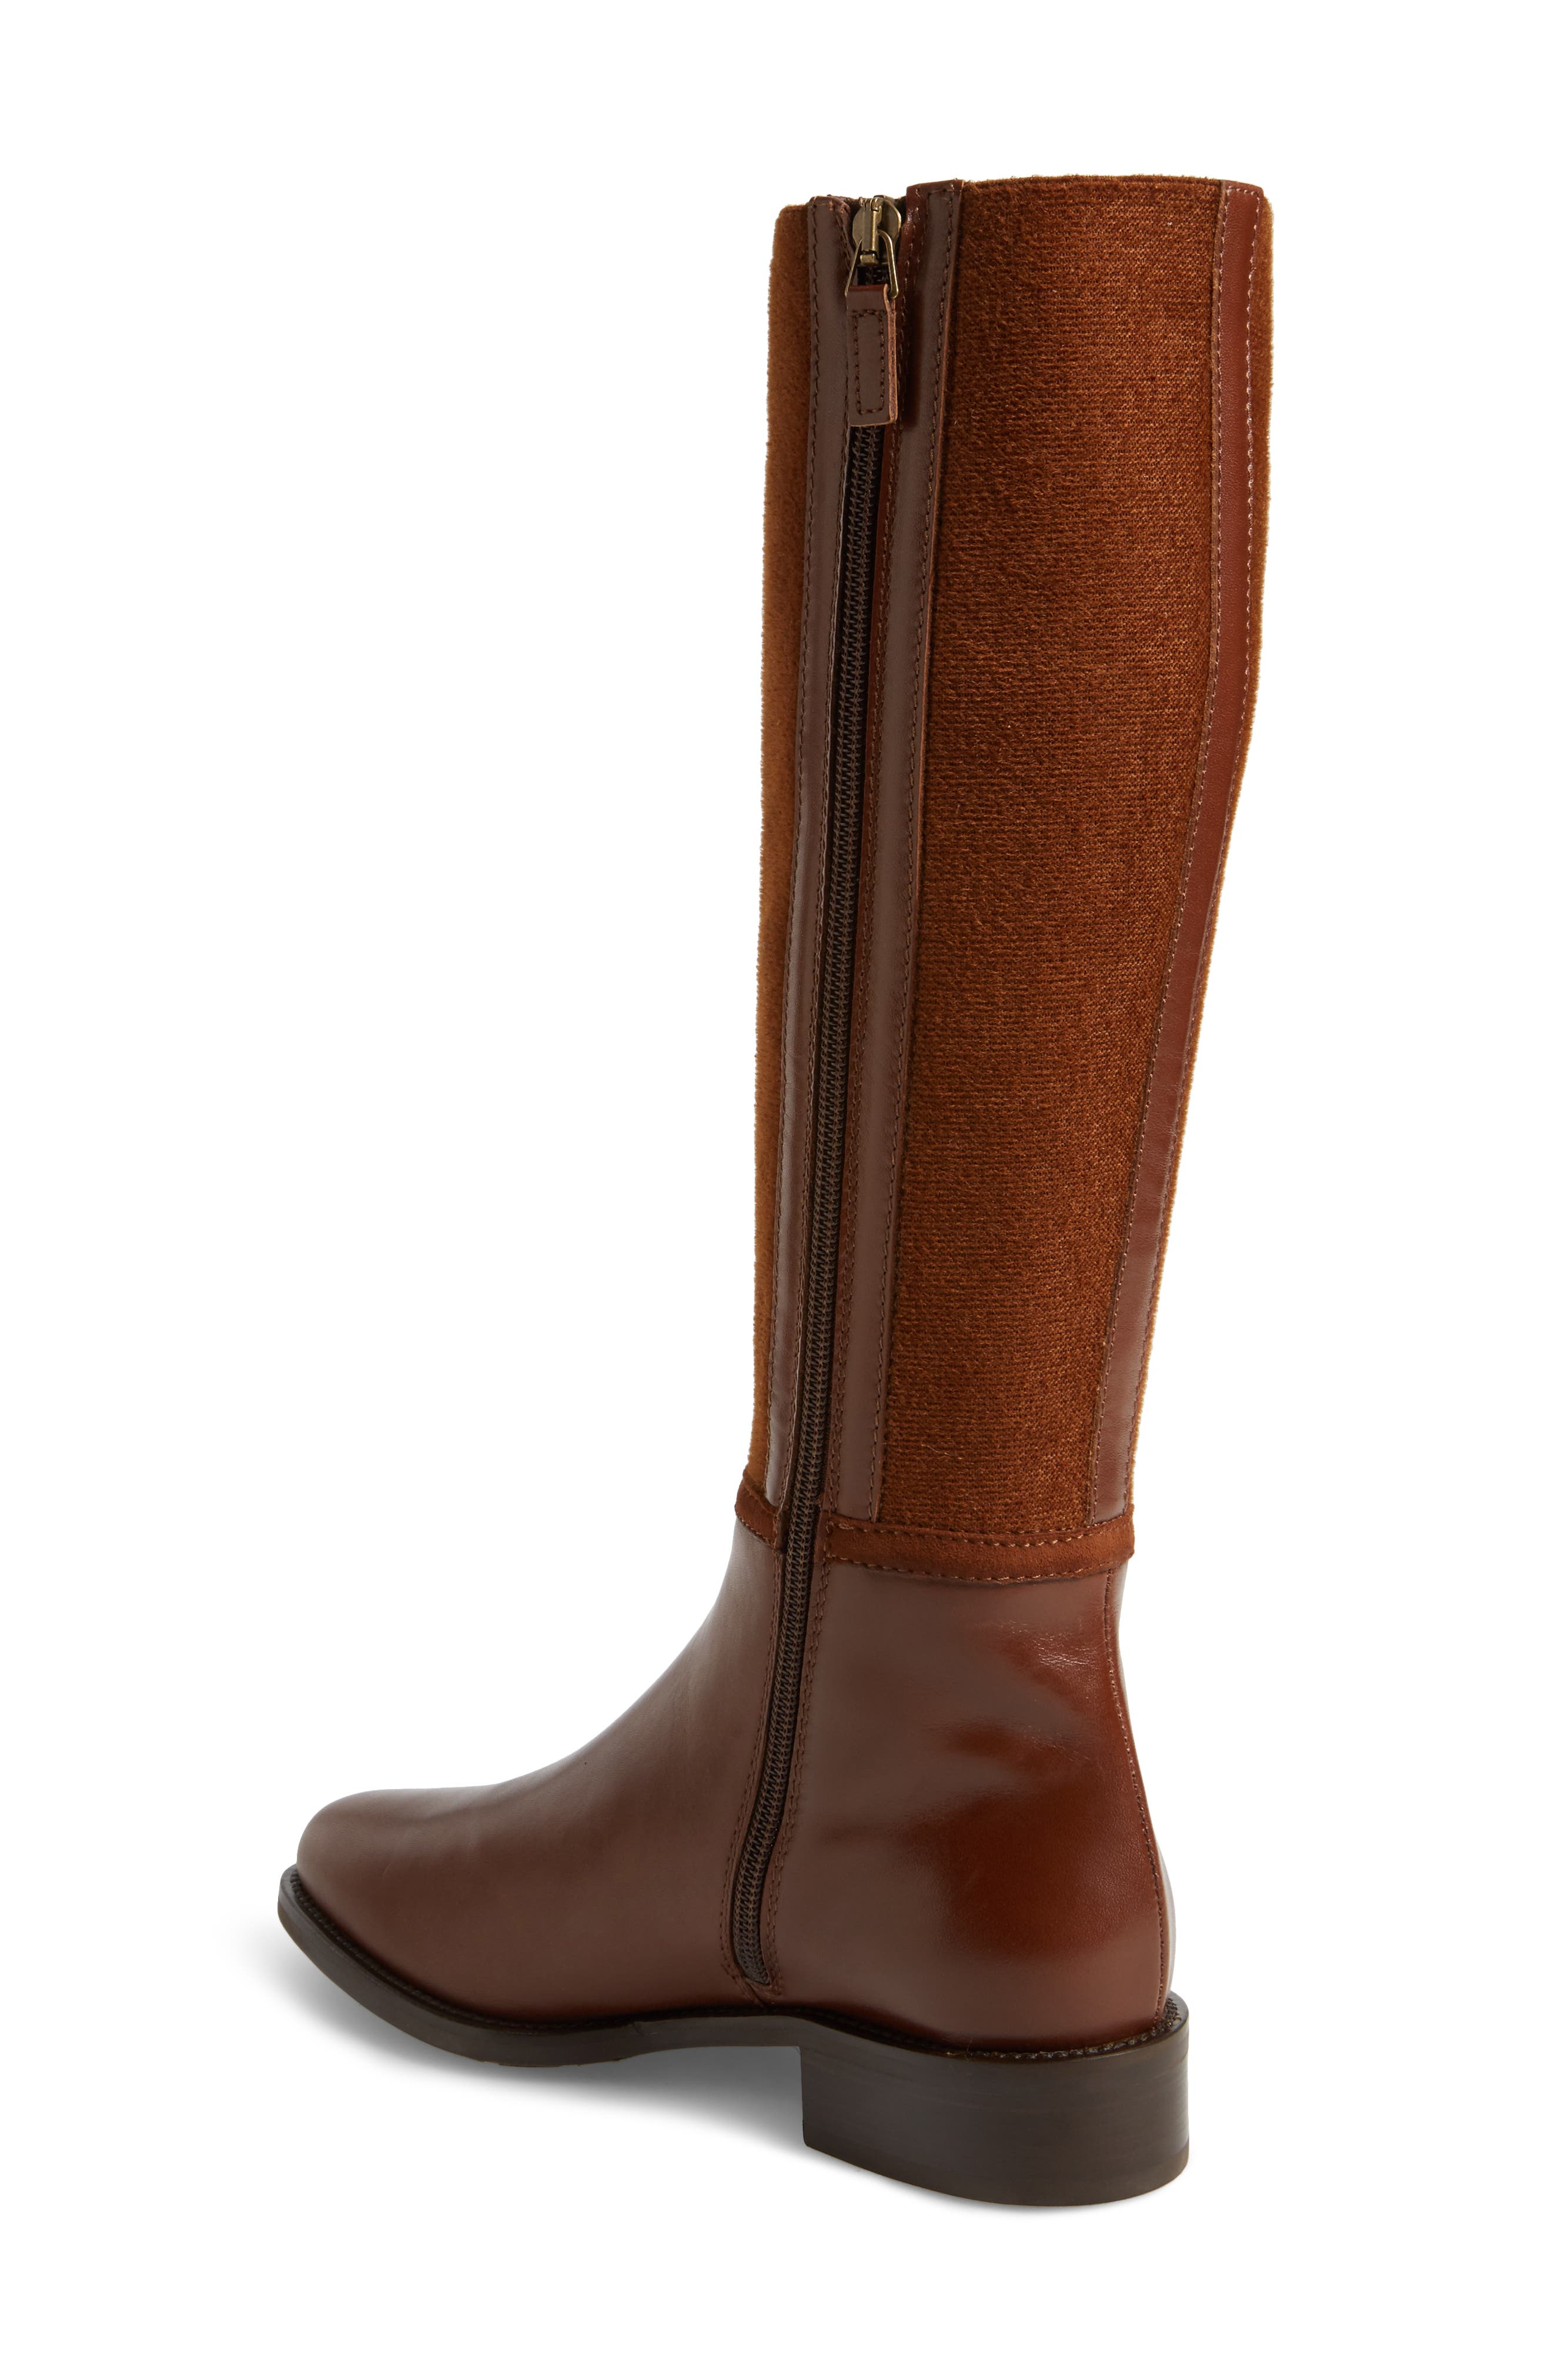 Nicolette Weatherproof Knee High Boot,                             Alternate thumbnail 2, color,                             Castagno Calf/ Elastic